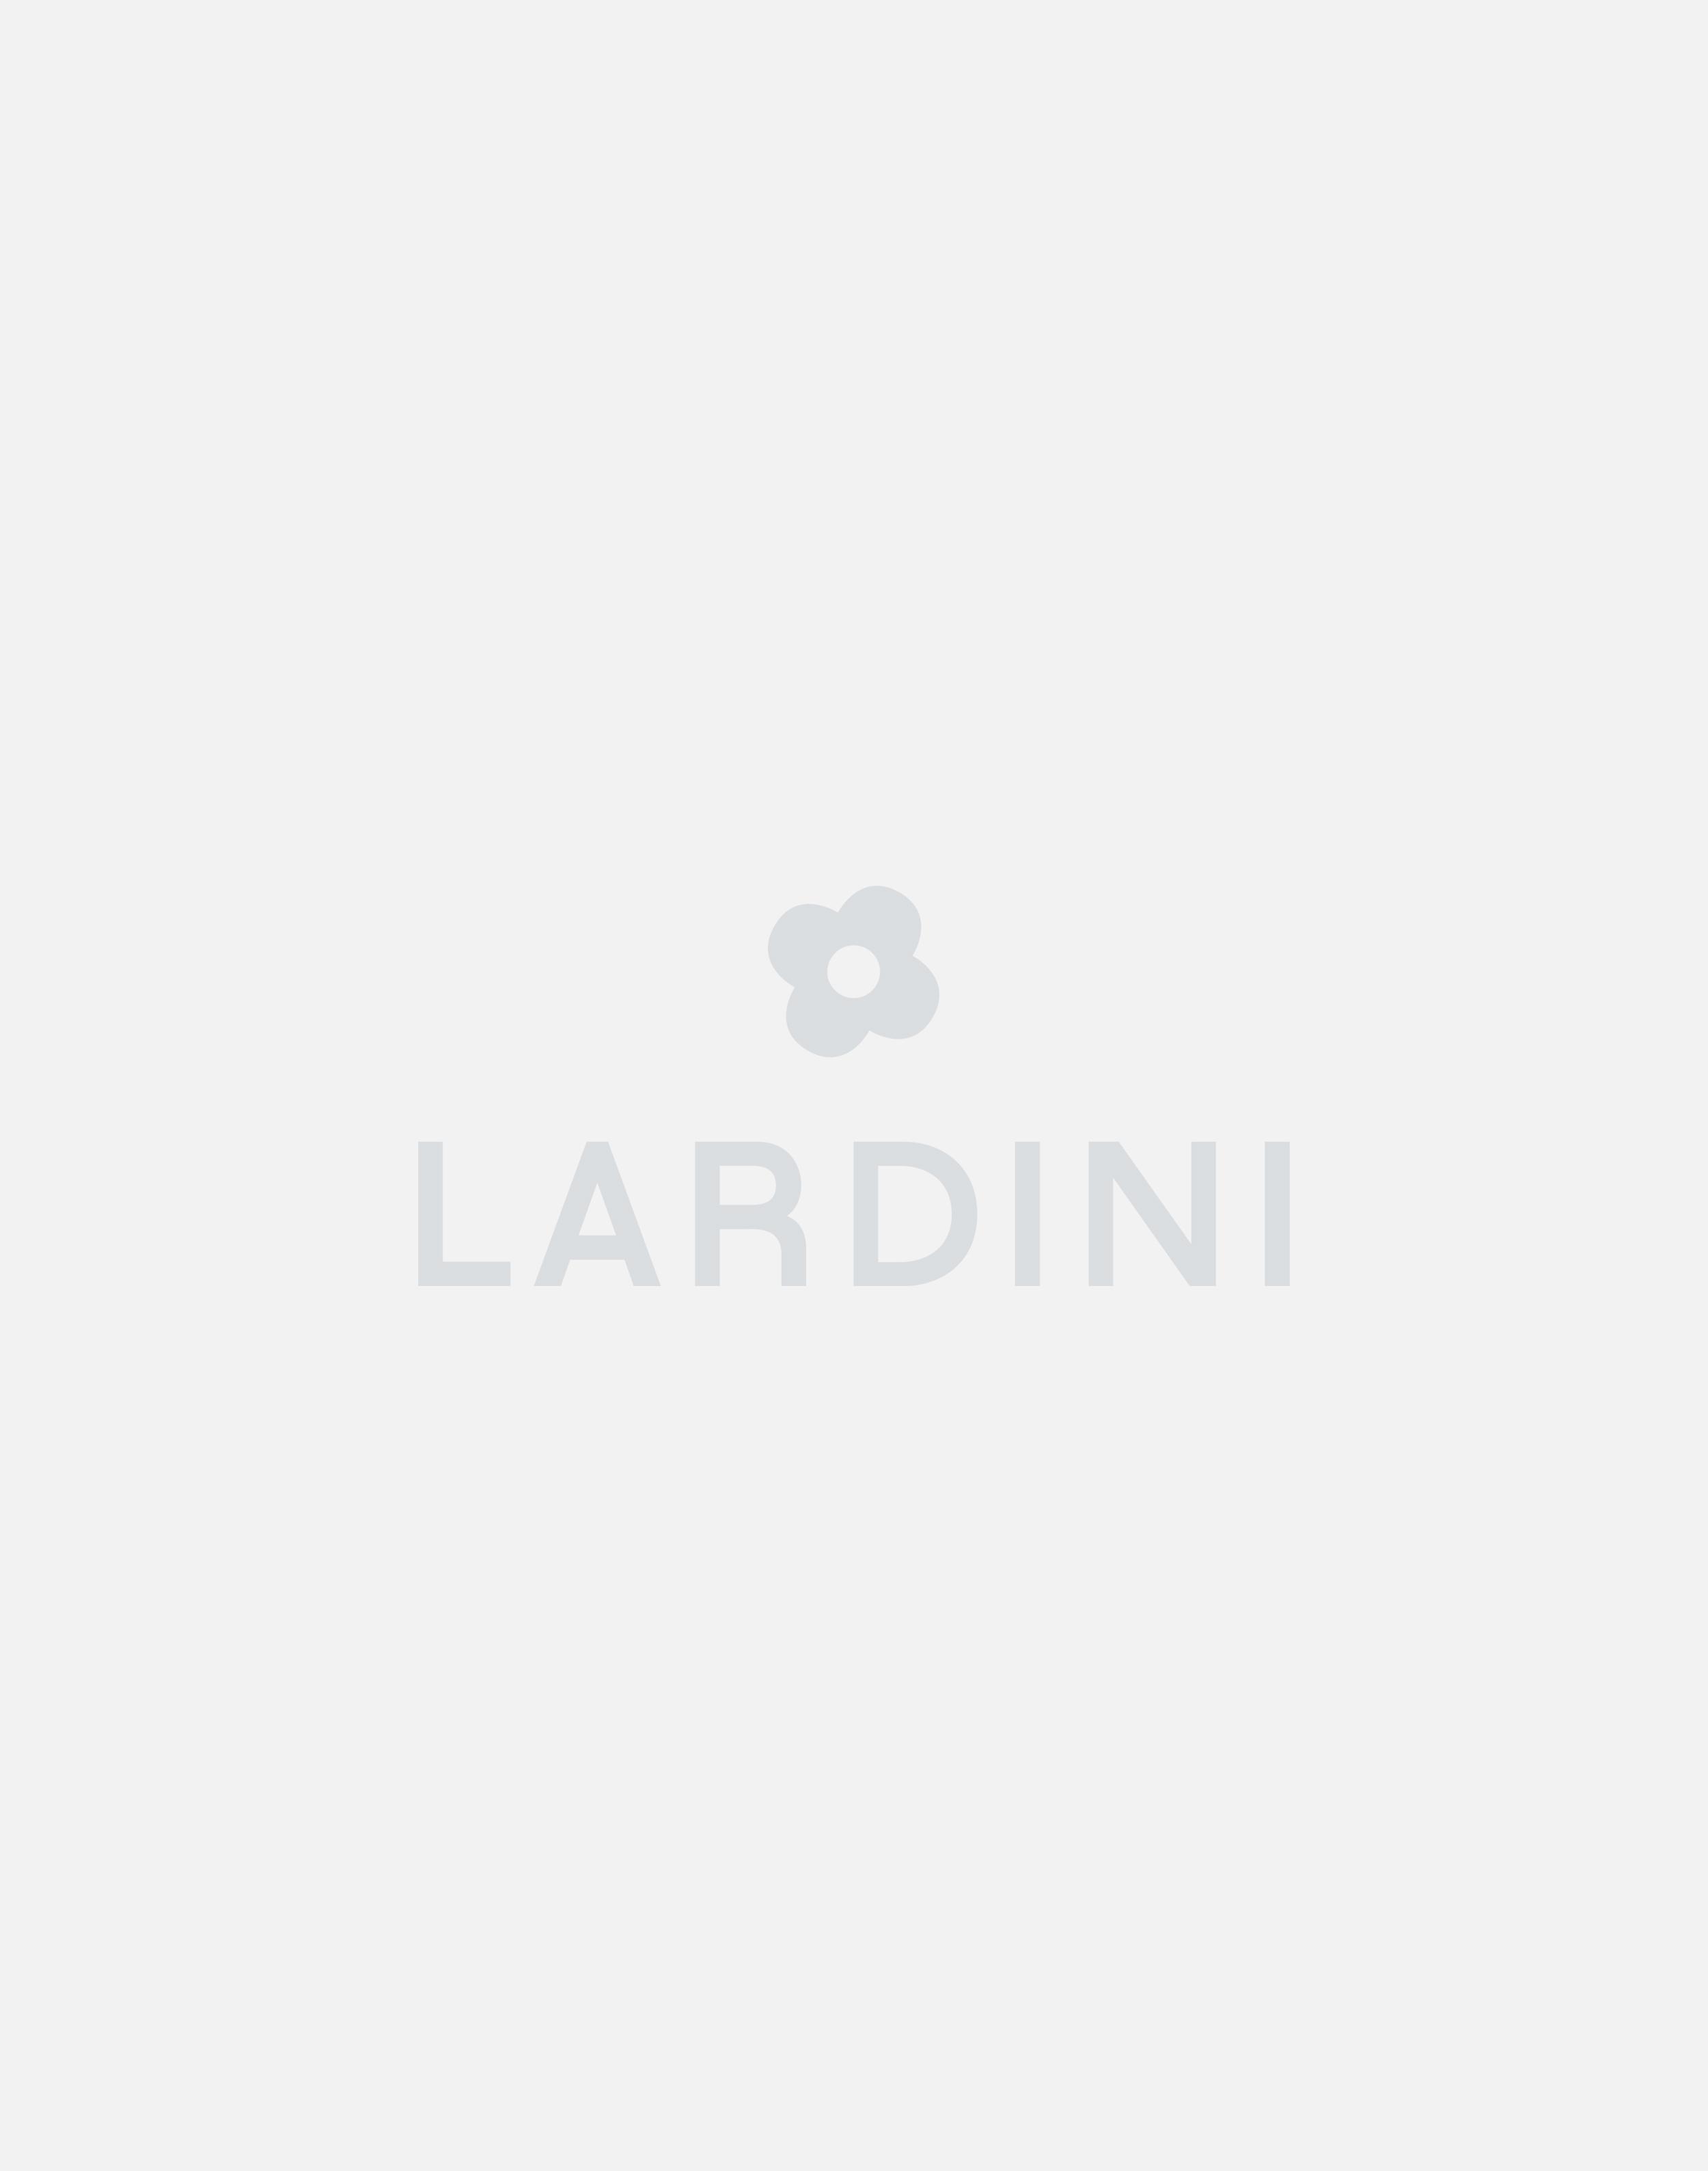 Grey/black/burgundy houndstooth robe jacket with belt